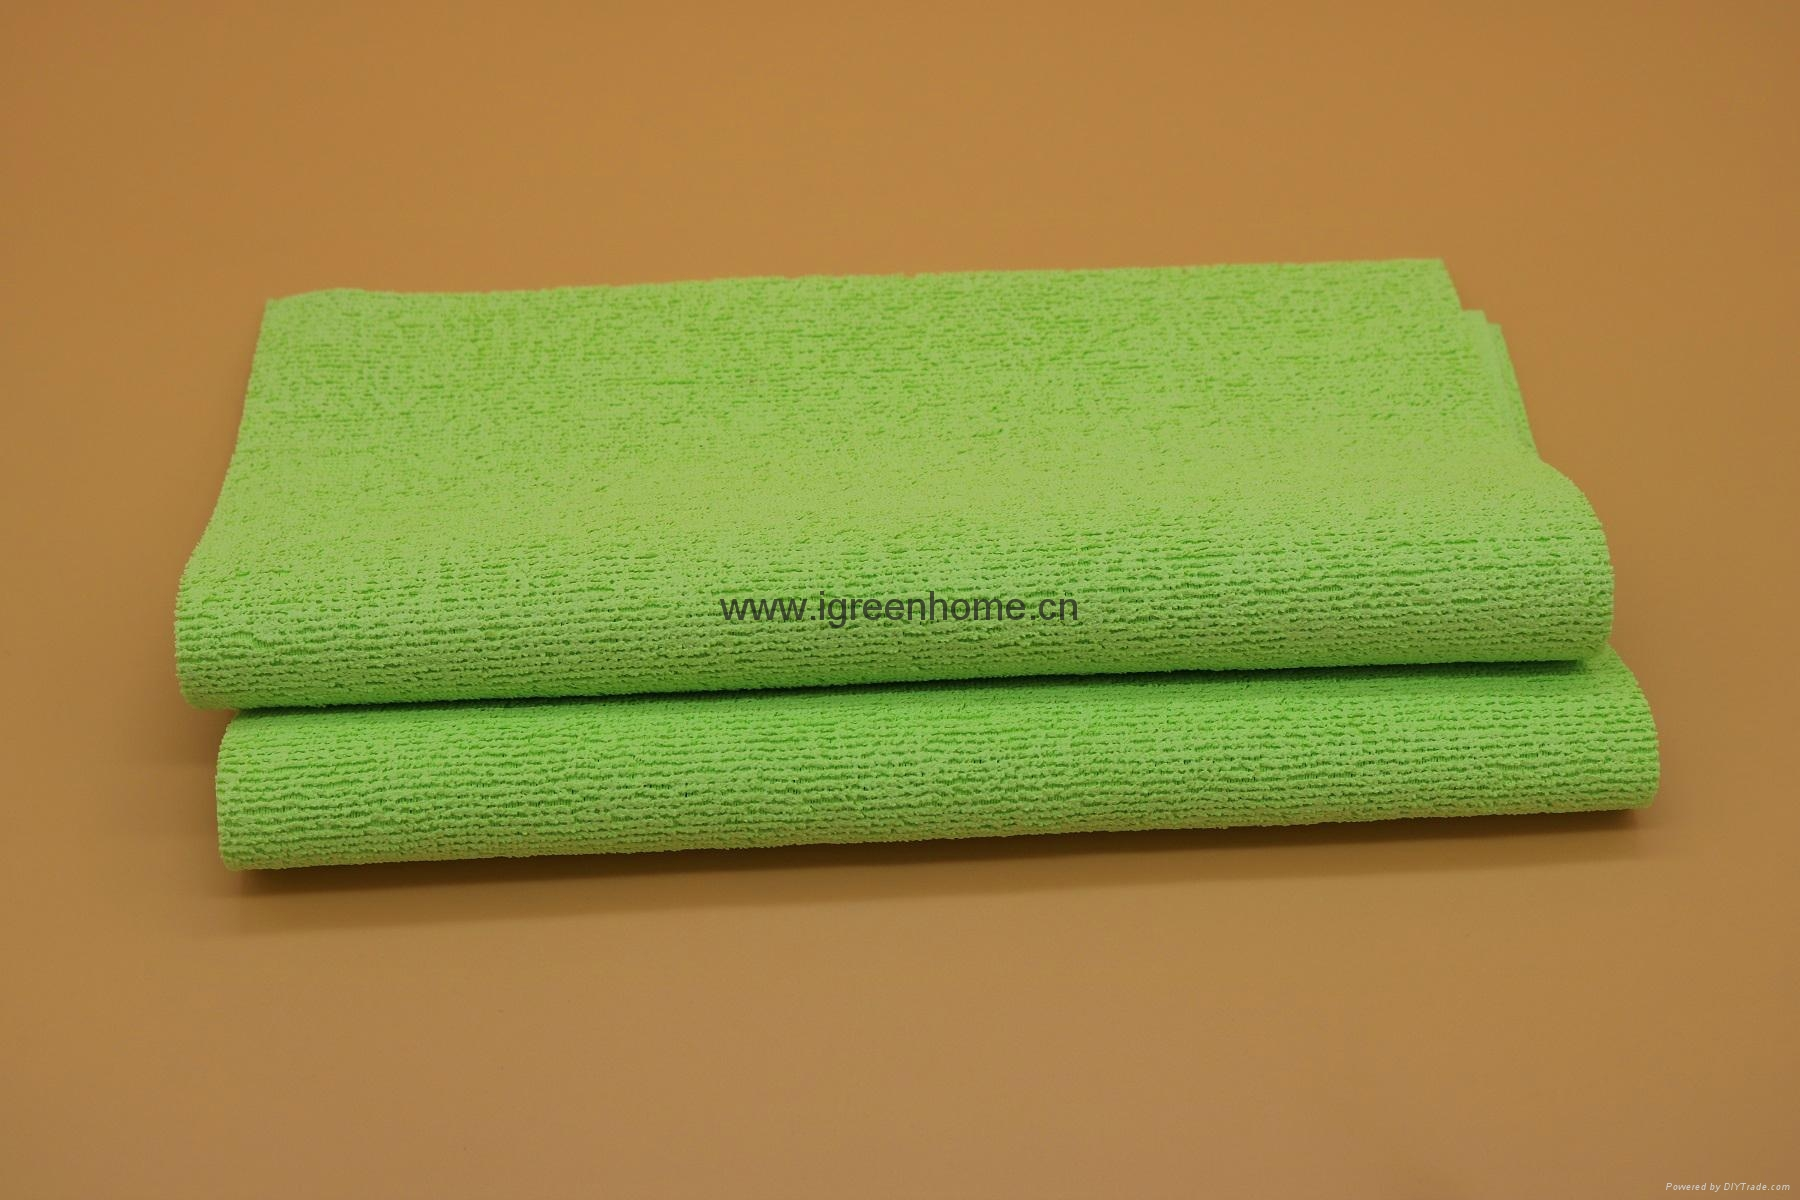 coated microfiber cloth 5